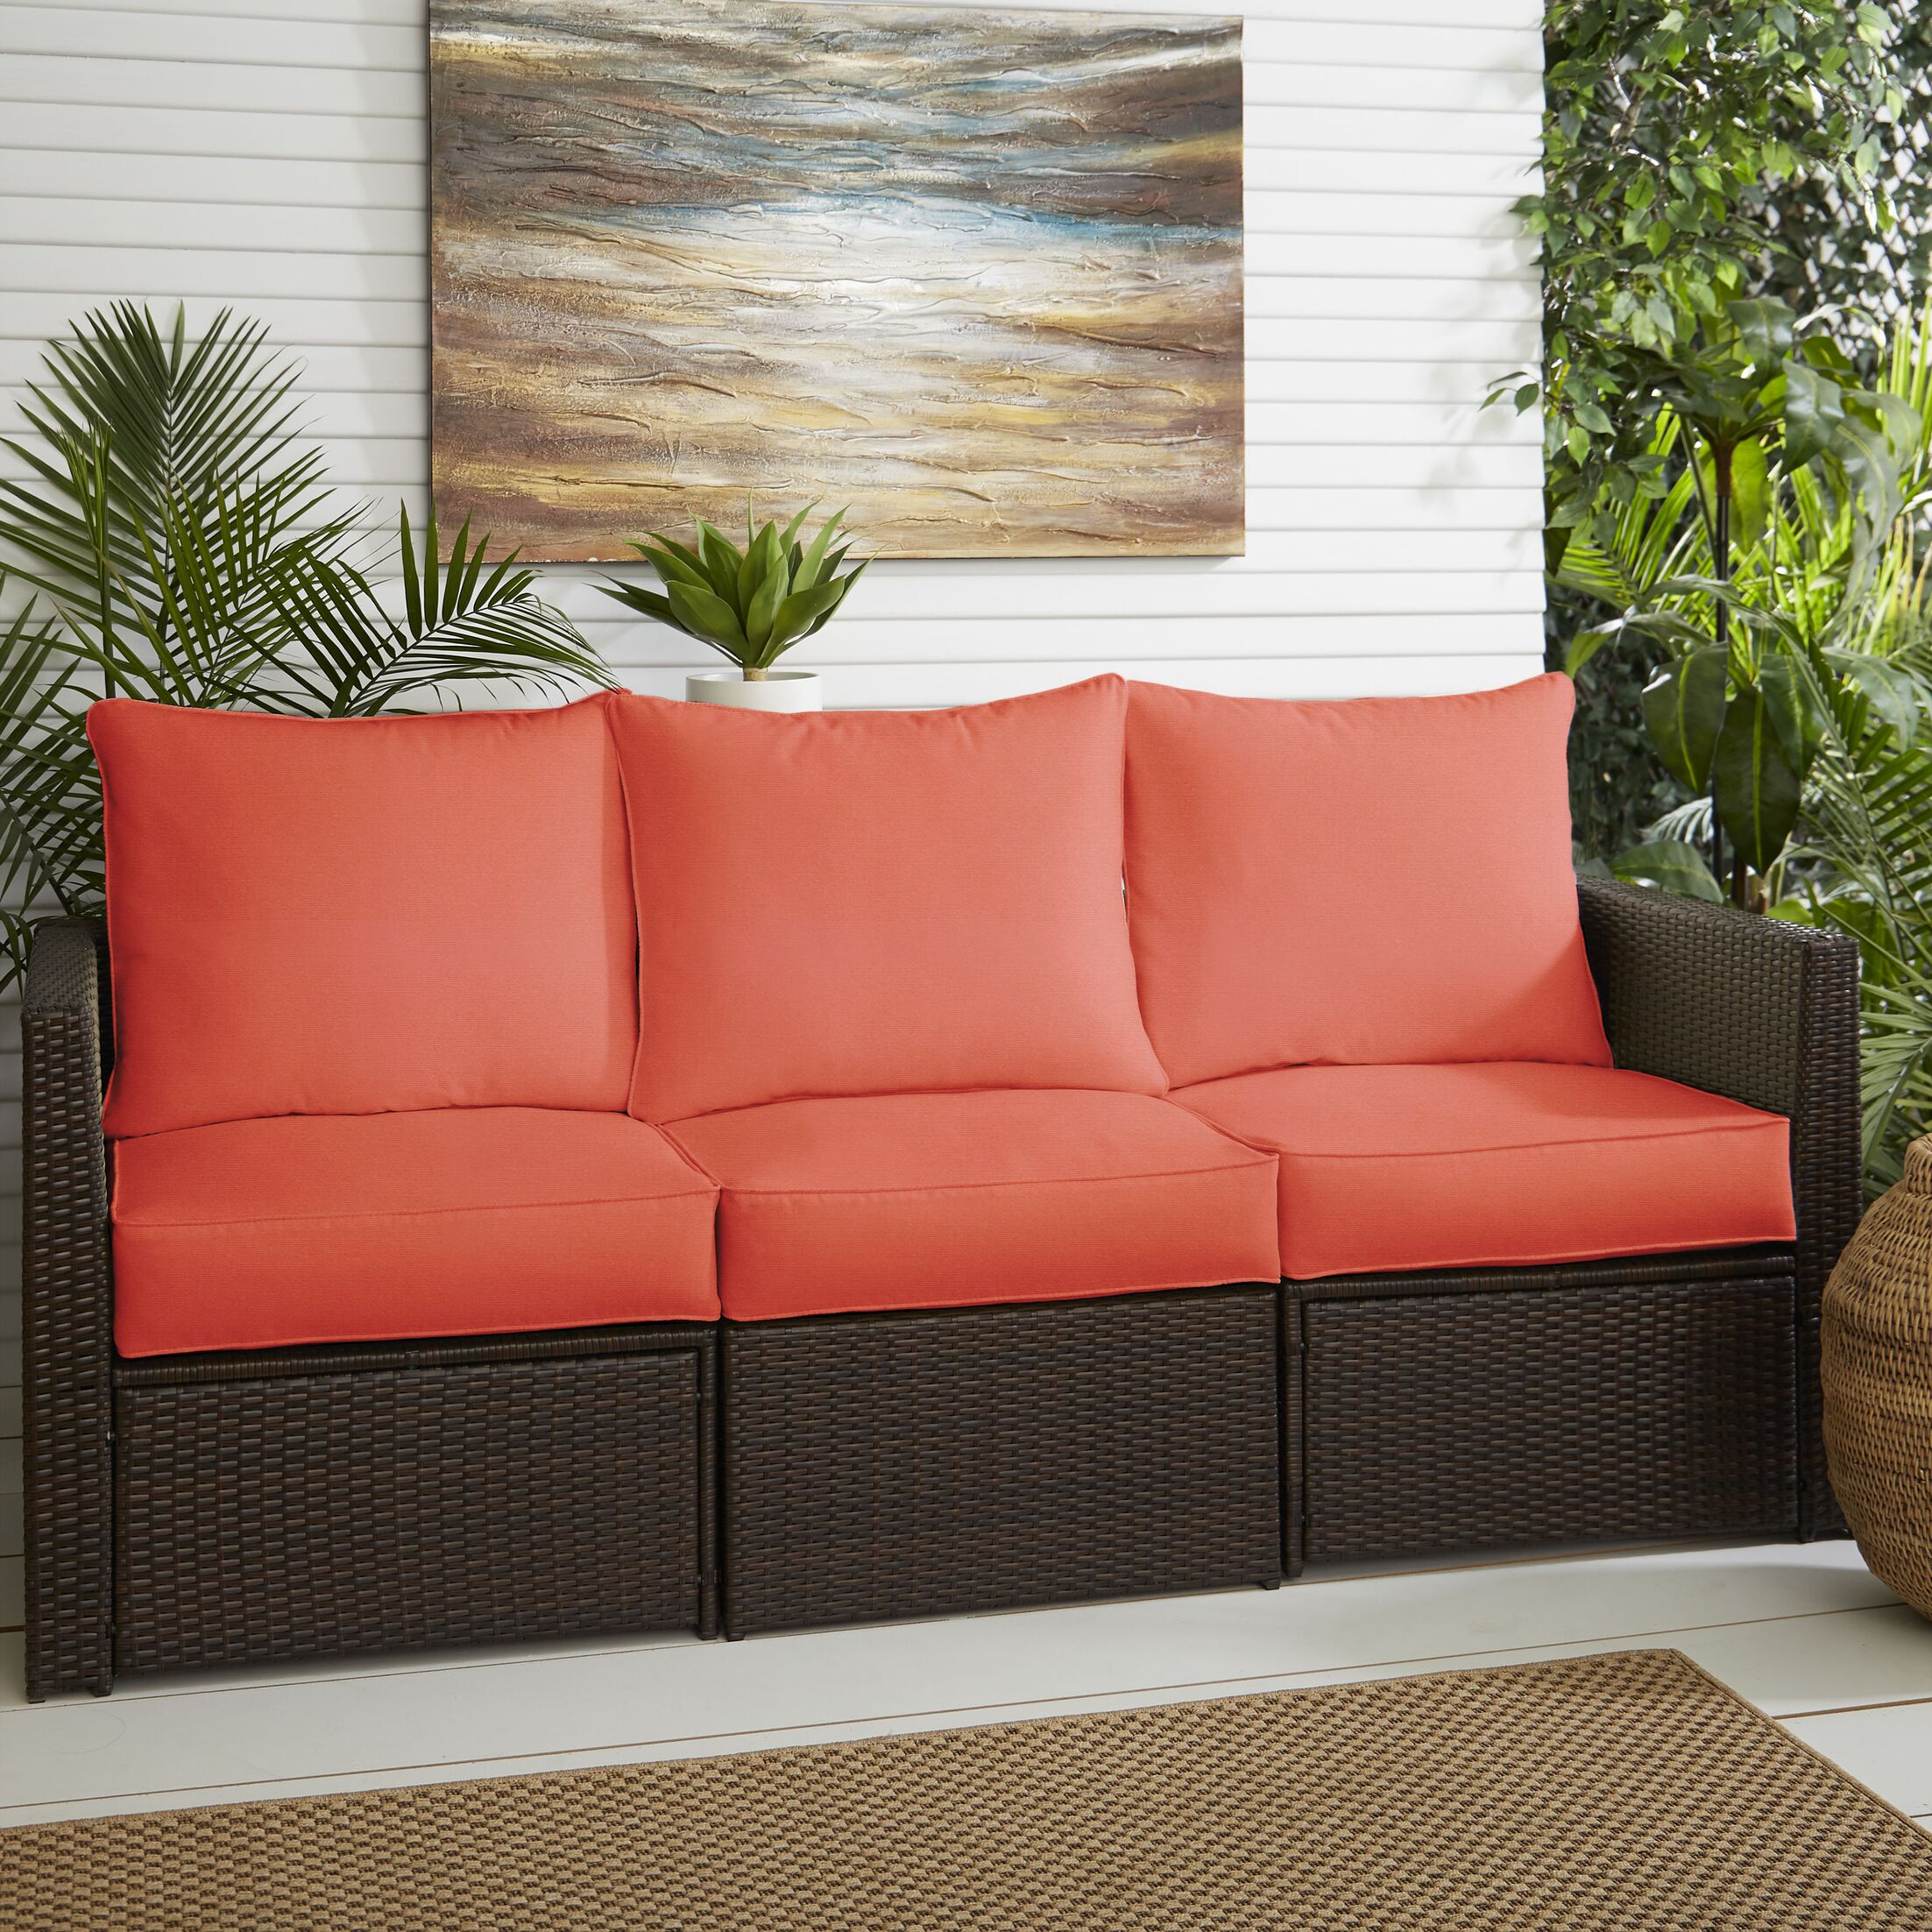 Indoor/Outdoor Sunbrella Sofa Cushion Fabric: Canvas Melon